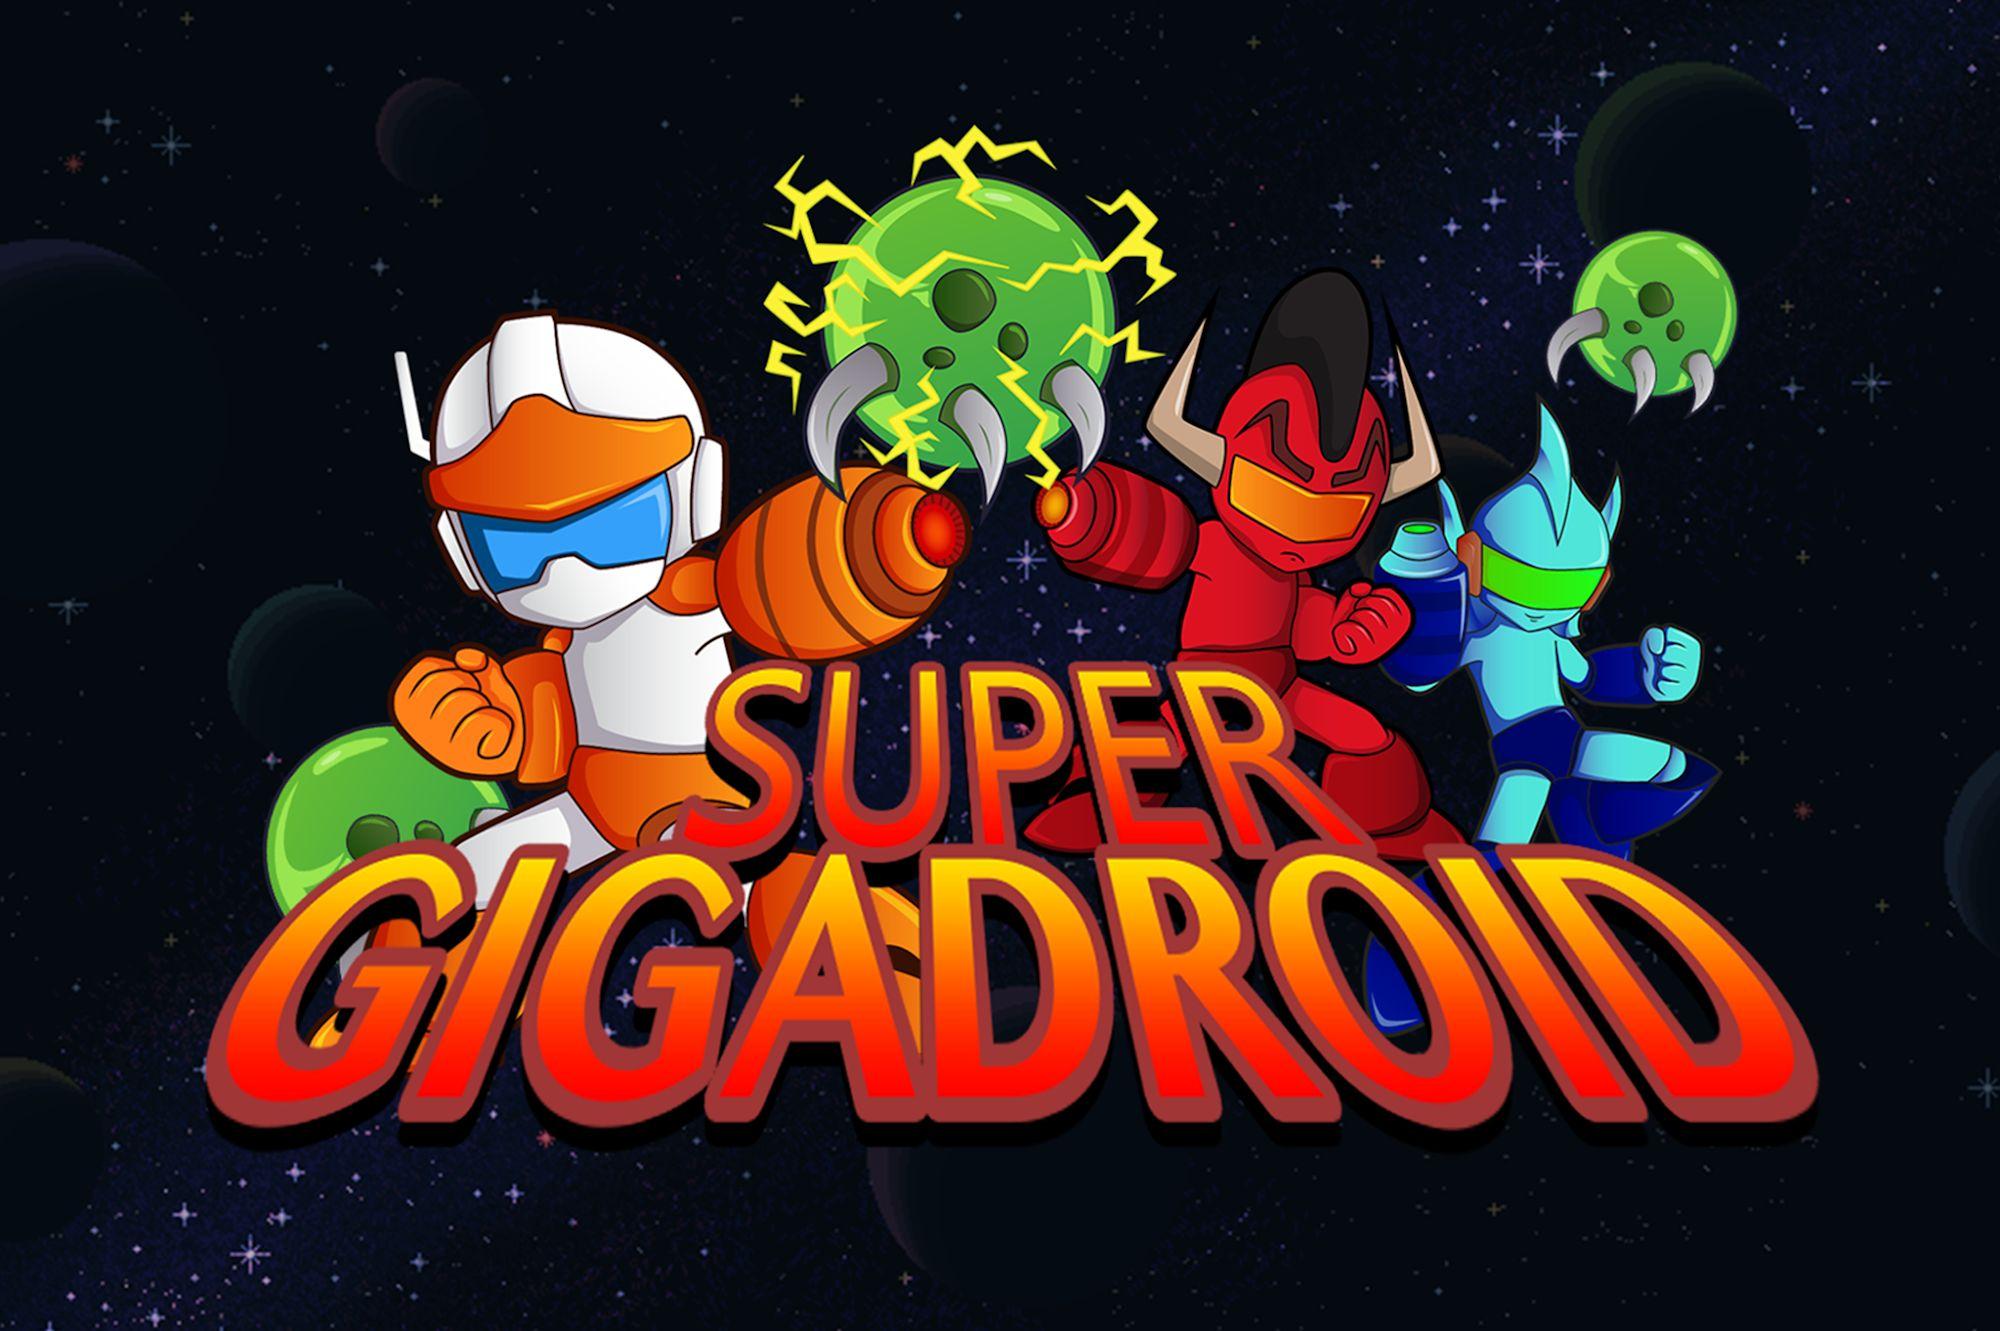 Super Gigadroid capture d'écran 1